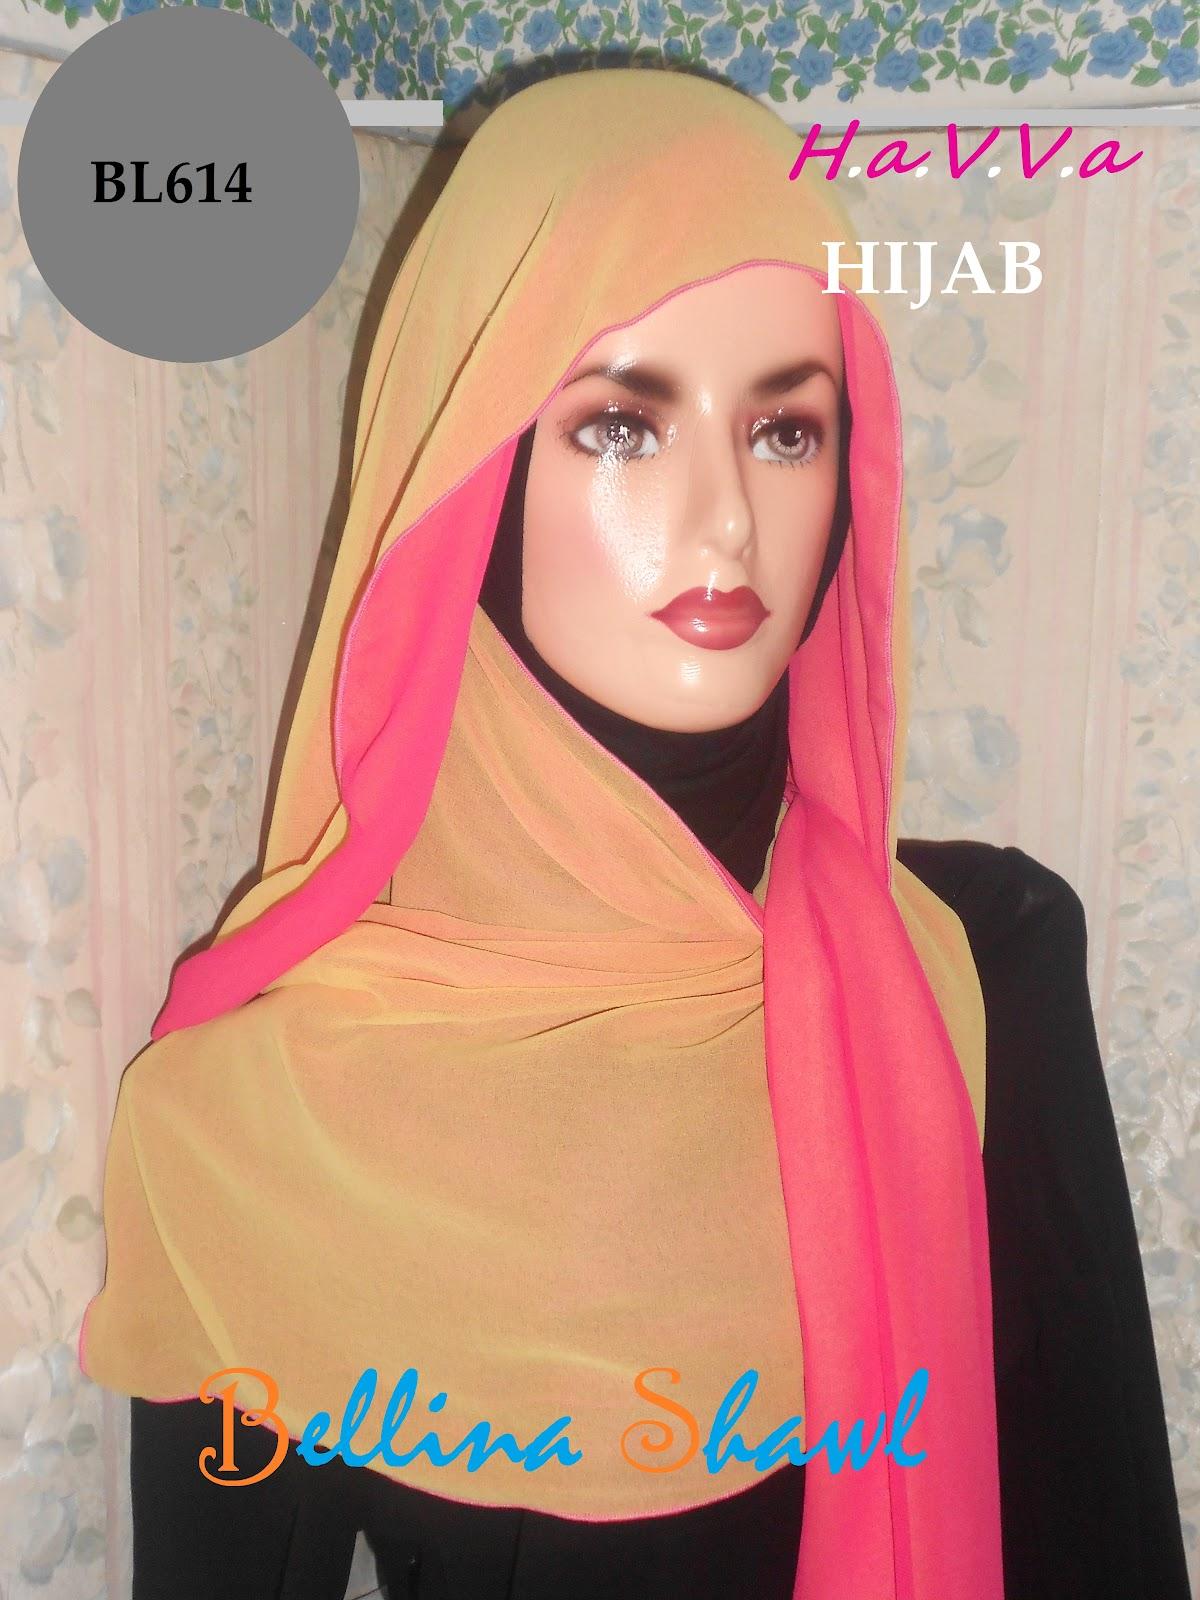 Bellina Shawl